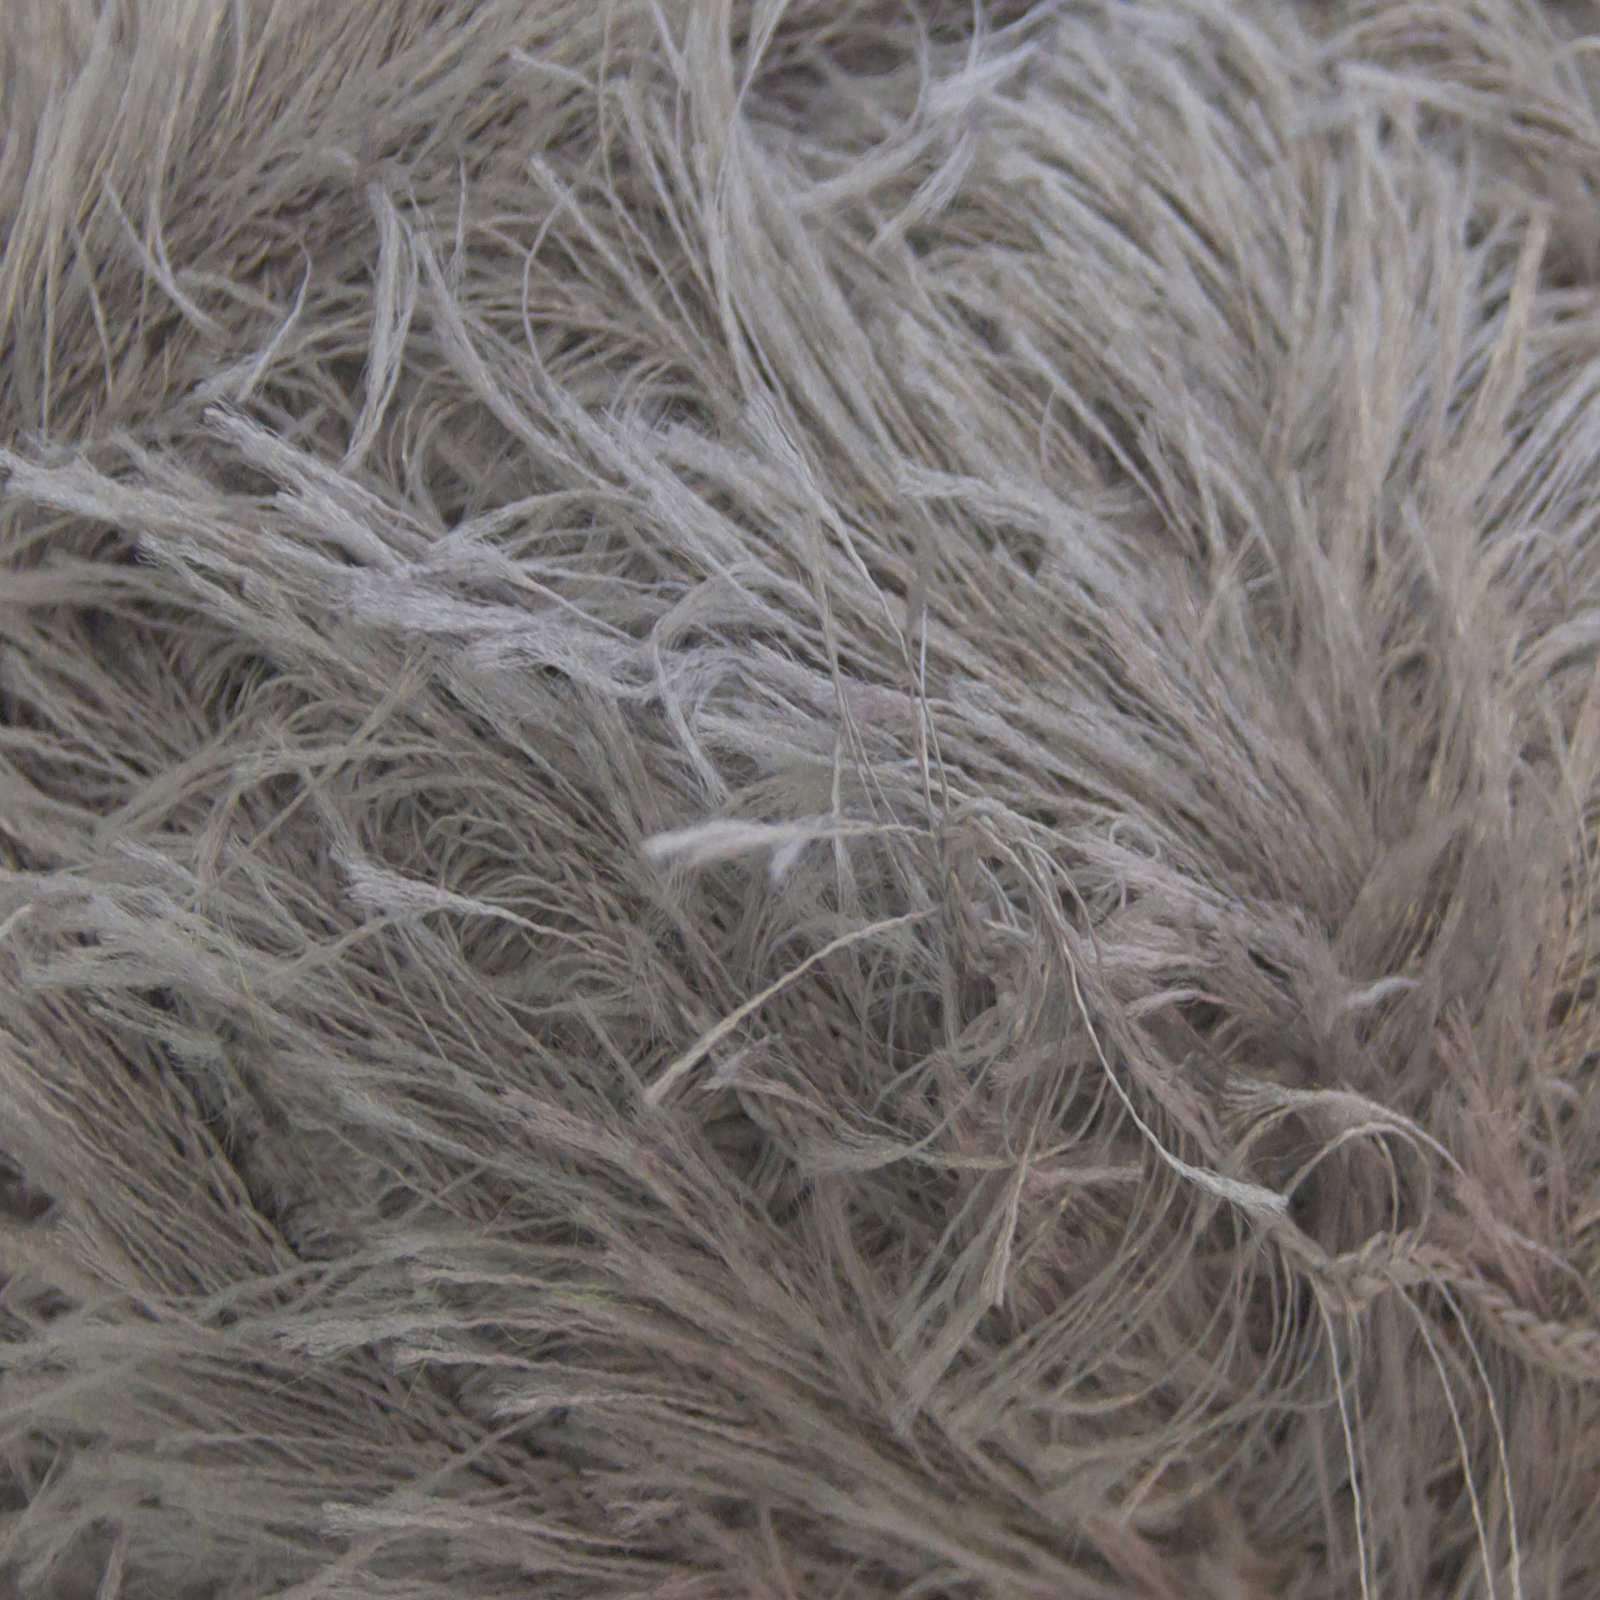 Eyelash Wool Knitting Patterns : Moments Knitting Yarn King Cole 50g Ball Fluffy Eyelash Feather Style Teddy W...